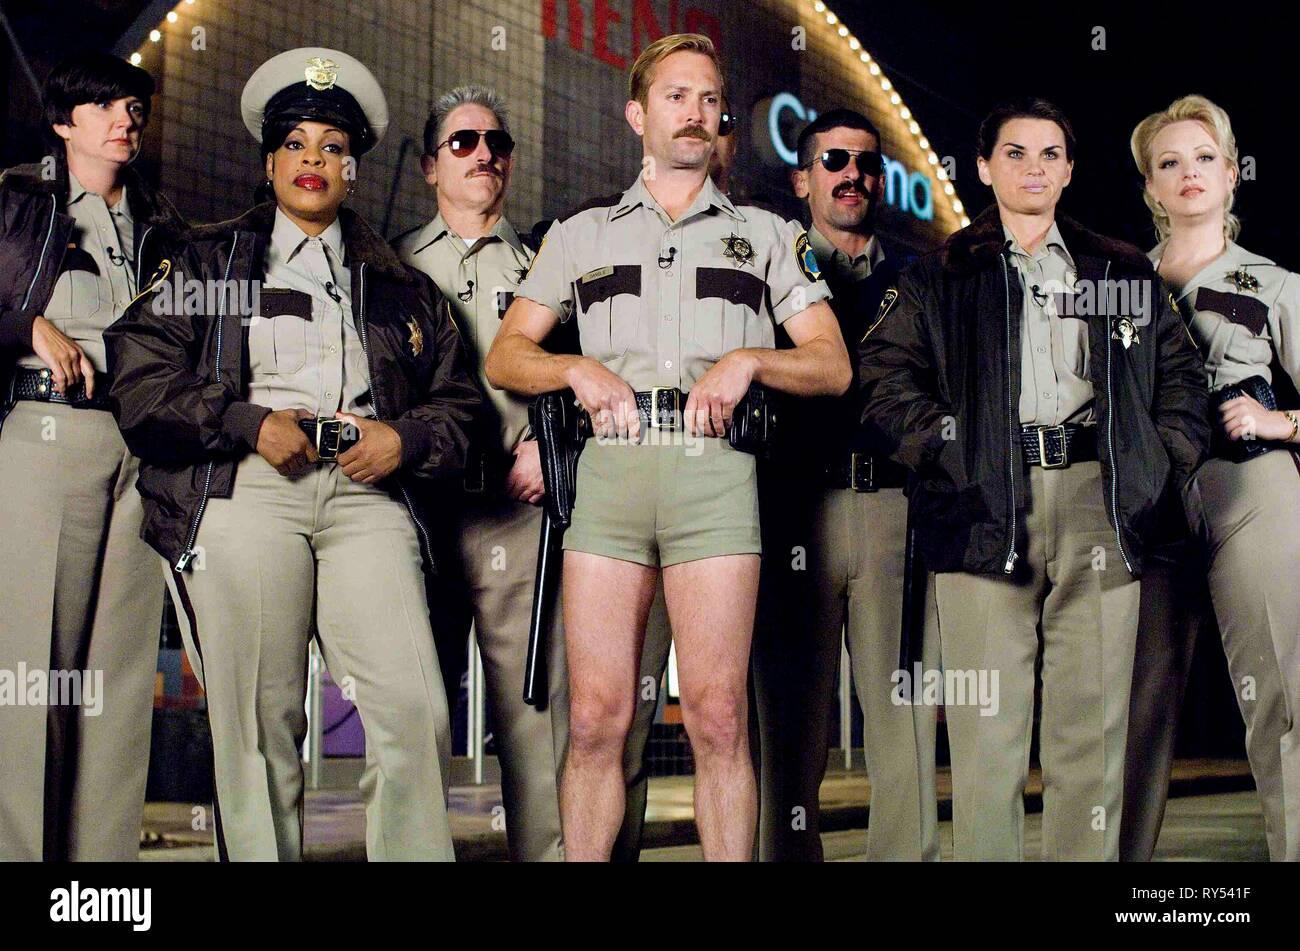 KENNEY,NASH,ALAZRAQUI,LENNON,GARANT,BIRDSONG,MCLENDON-COVEY, RENO 911!: MIAMI, 2007 - Stock Image